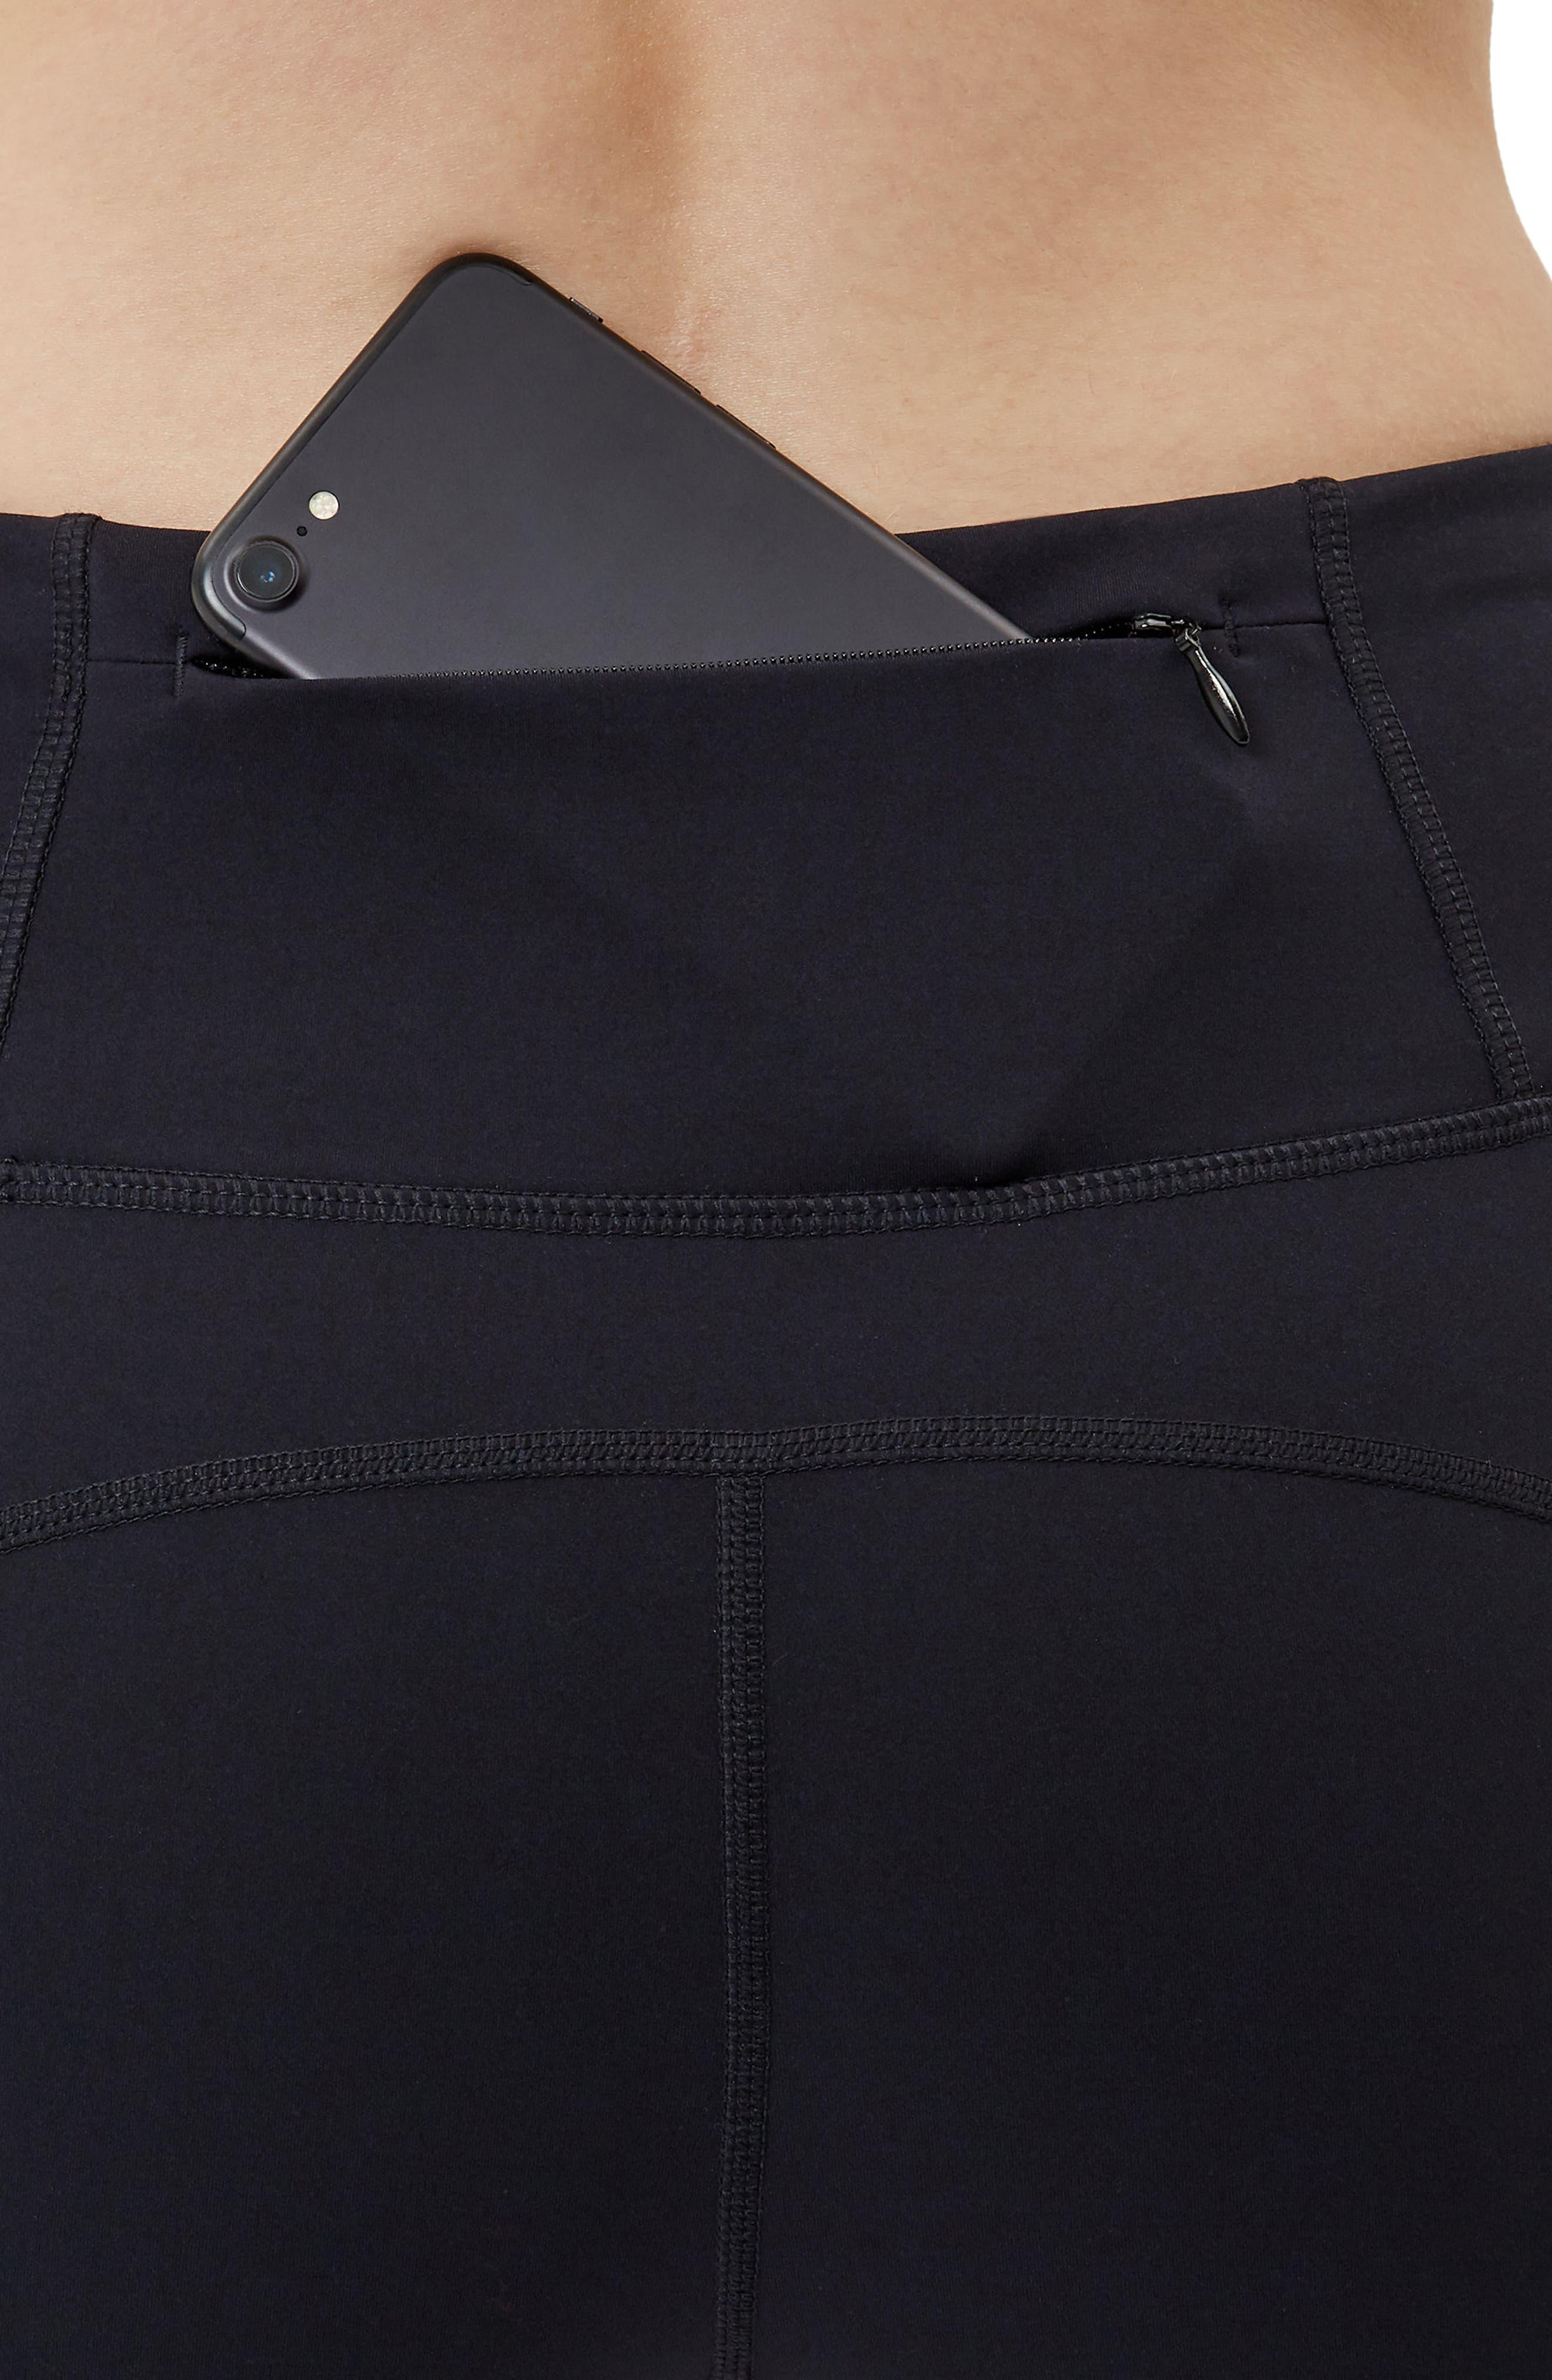 SWEATY BETTY, Power Workout Crop Leggings, Alternate thumbnail 6, color, BLACK